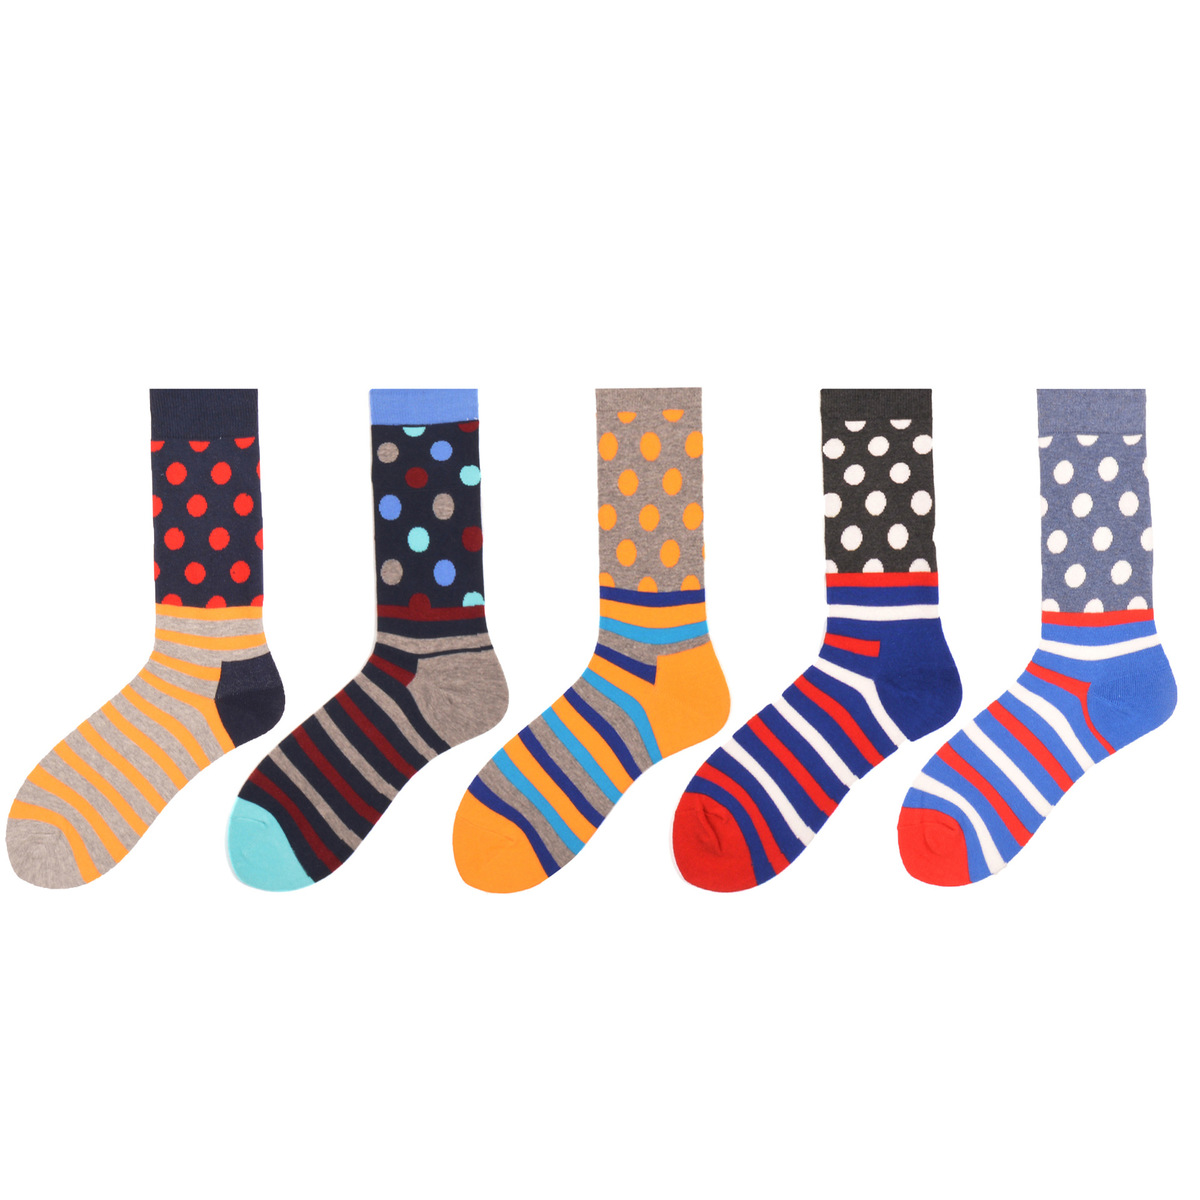 PEONFLY European Personality happy Tide Brand funny mens Socks Originality Stripe Small dot Stitching men dress cotton Sock